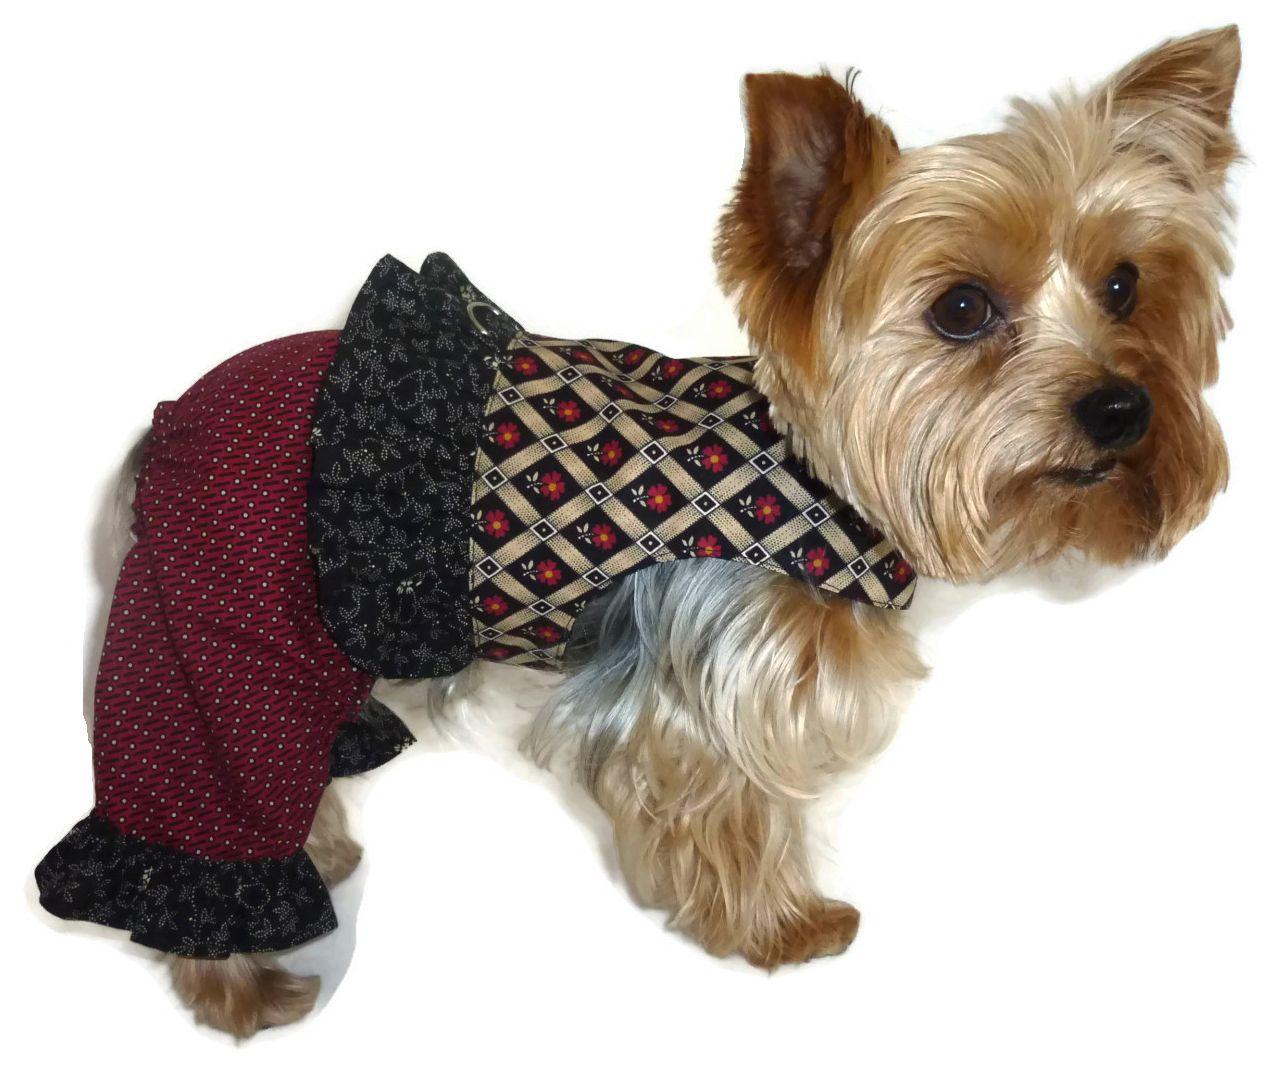 Dog clothes sewing pattern 1548 elli kay pantsuit for the little dog clothes sewing pattern 1548 elli kay pantsuit for the little dog 825 jeuxipadfo Image collections